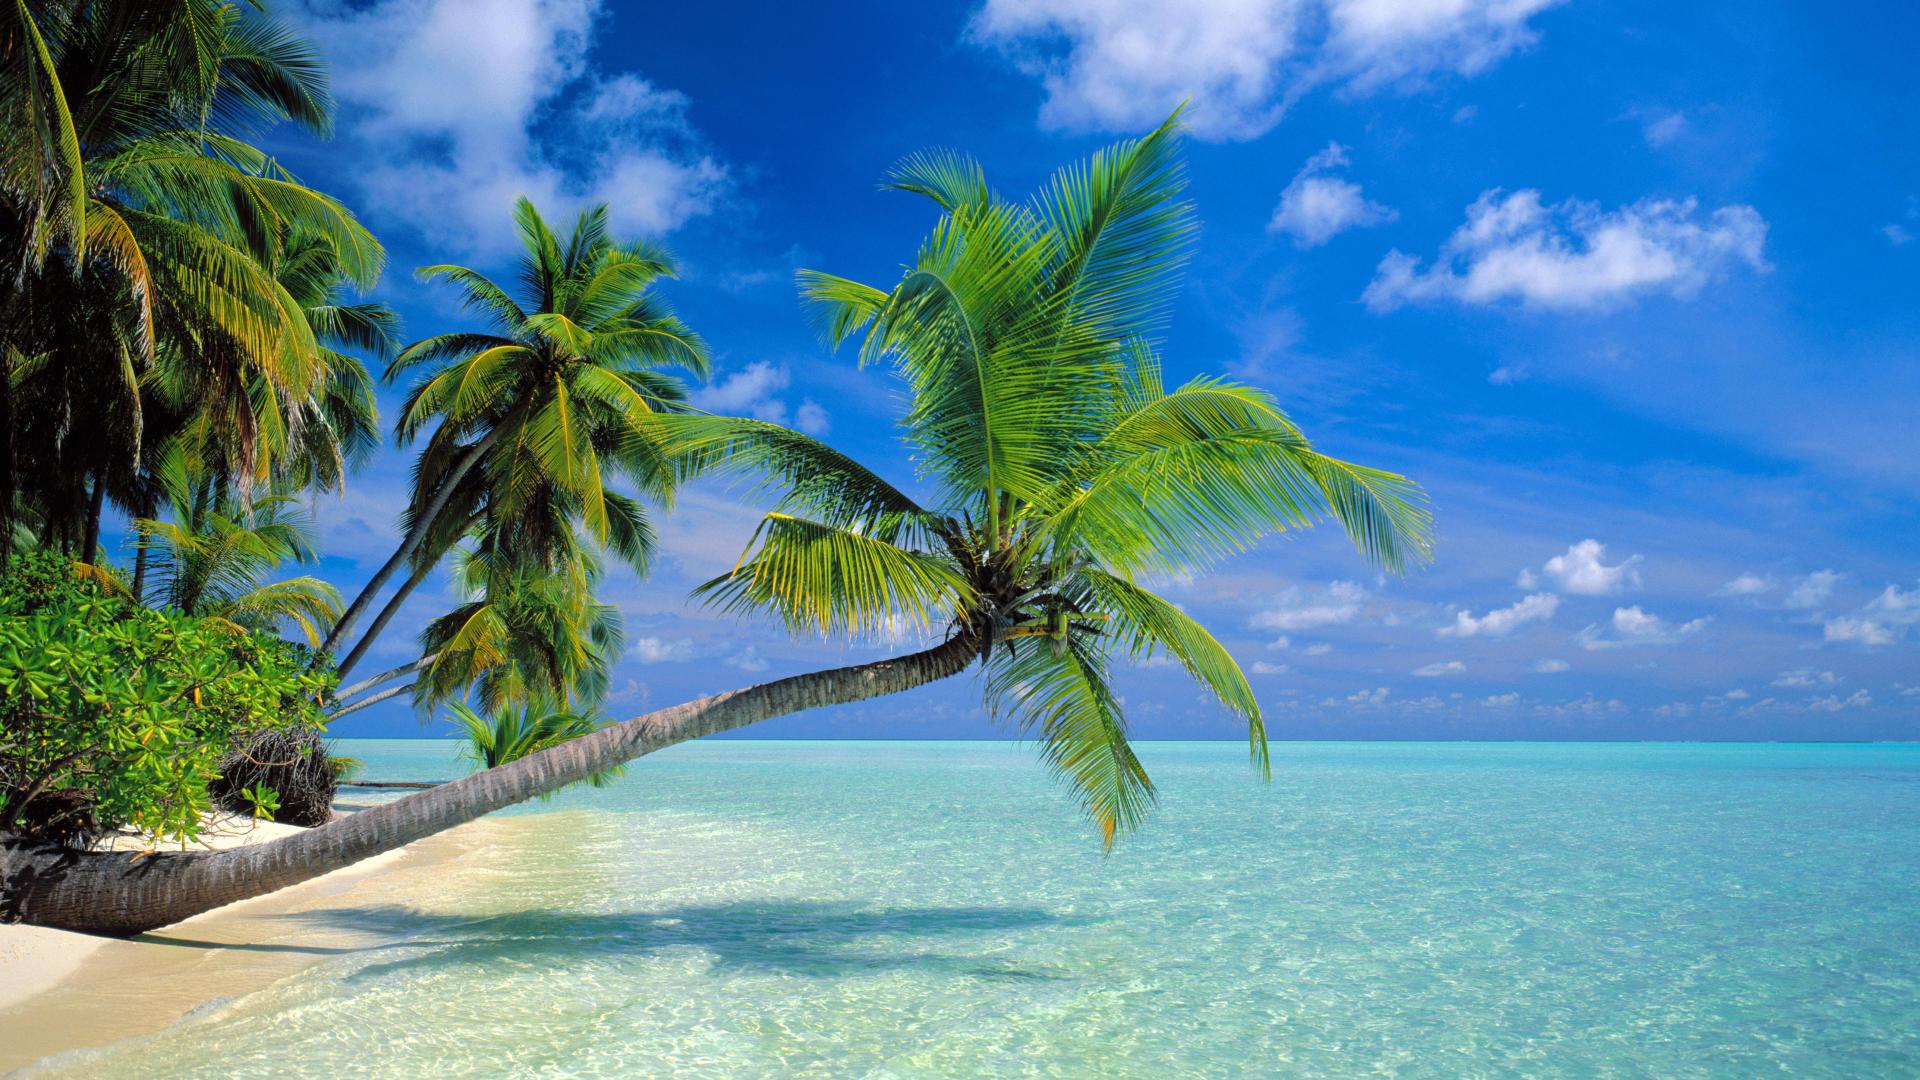 Maldives HD Wallpapers Desktop Backgrounds - WallpaperSafari